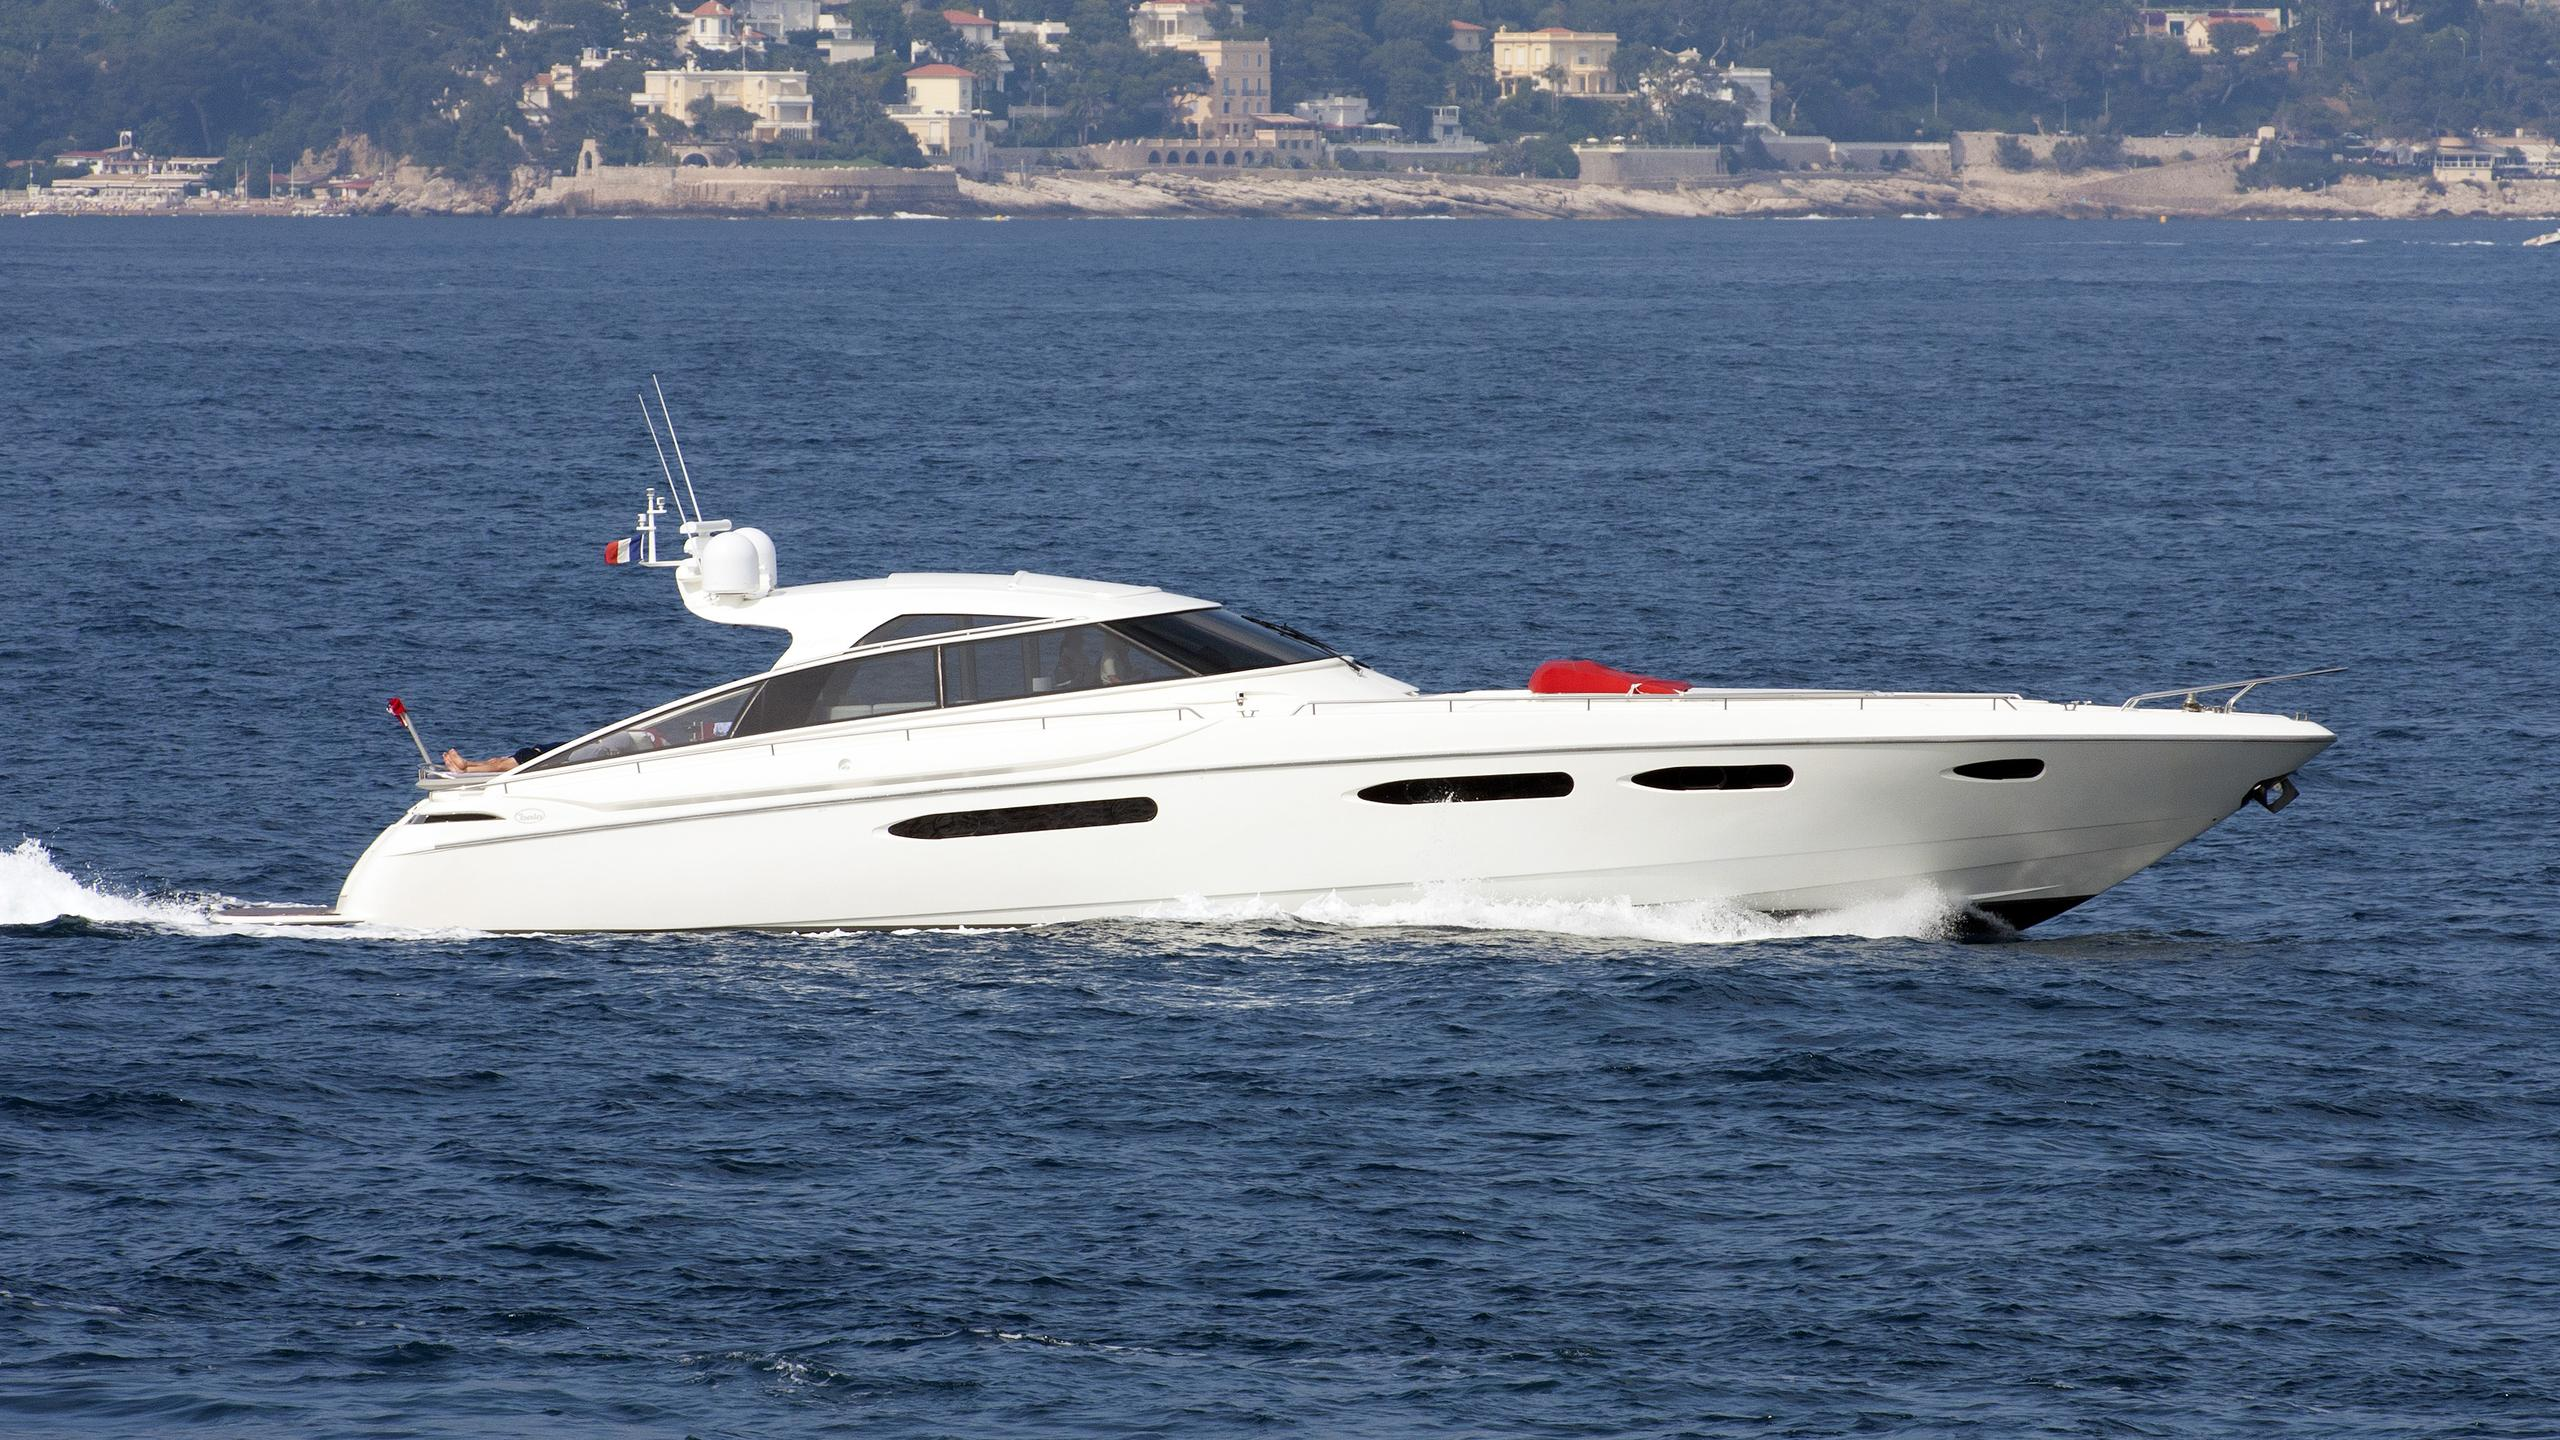 tobchi-motoryacht-baia-atlantica-2009-24m-profile-running